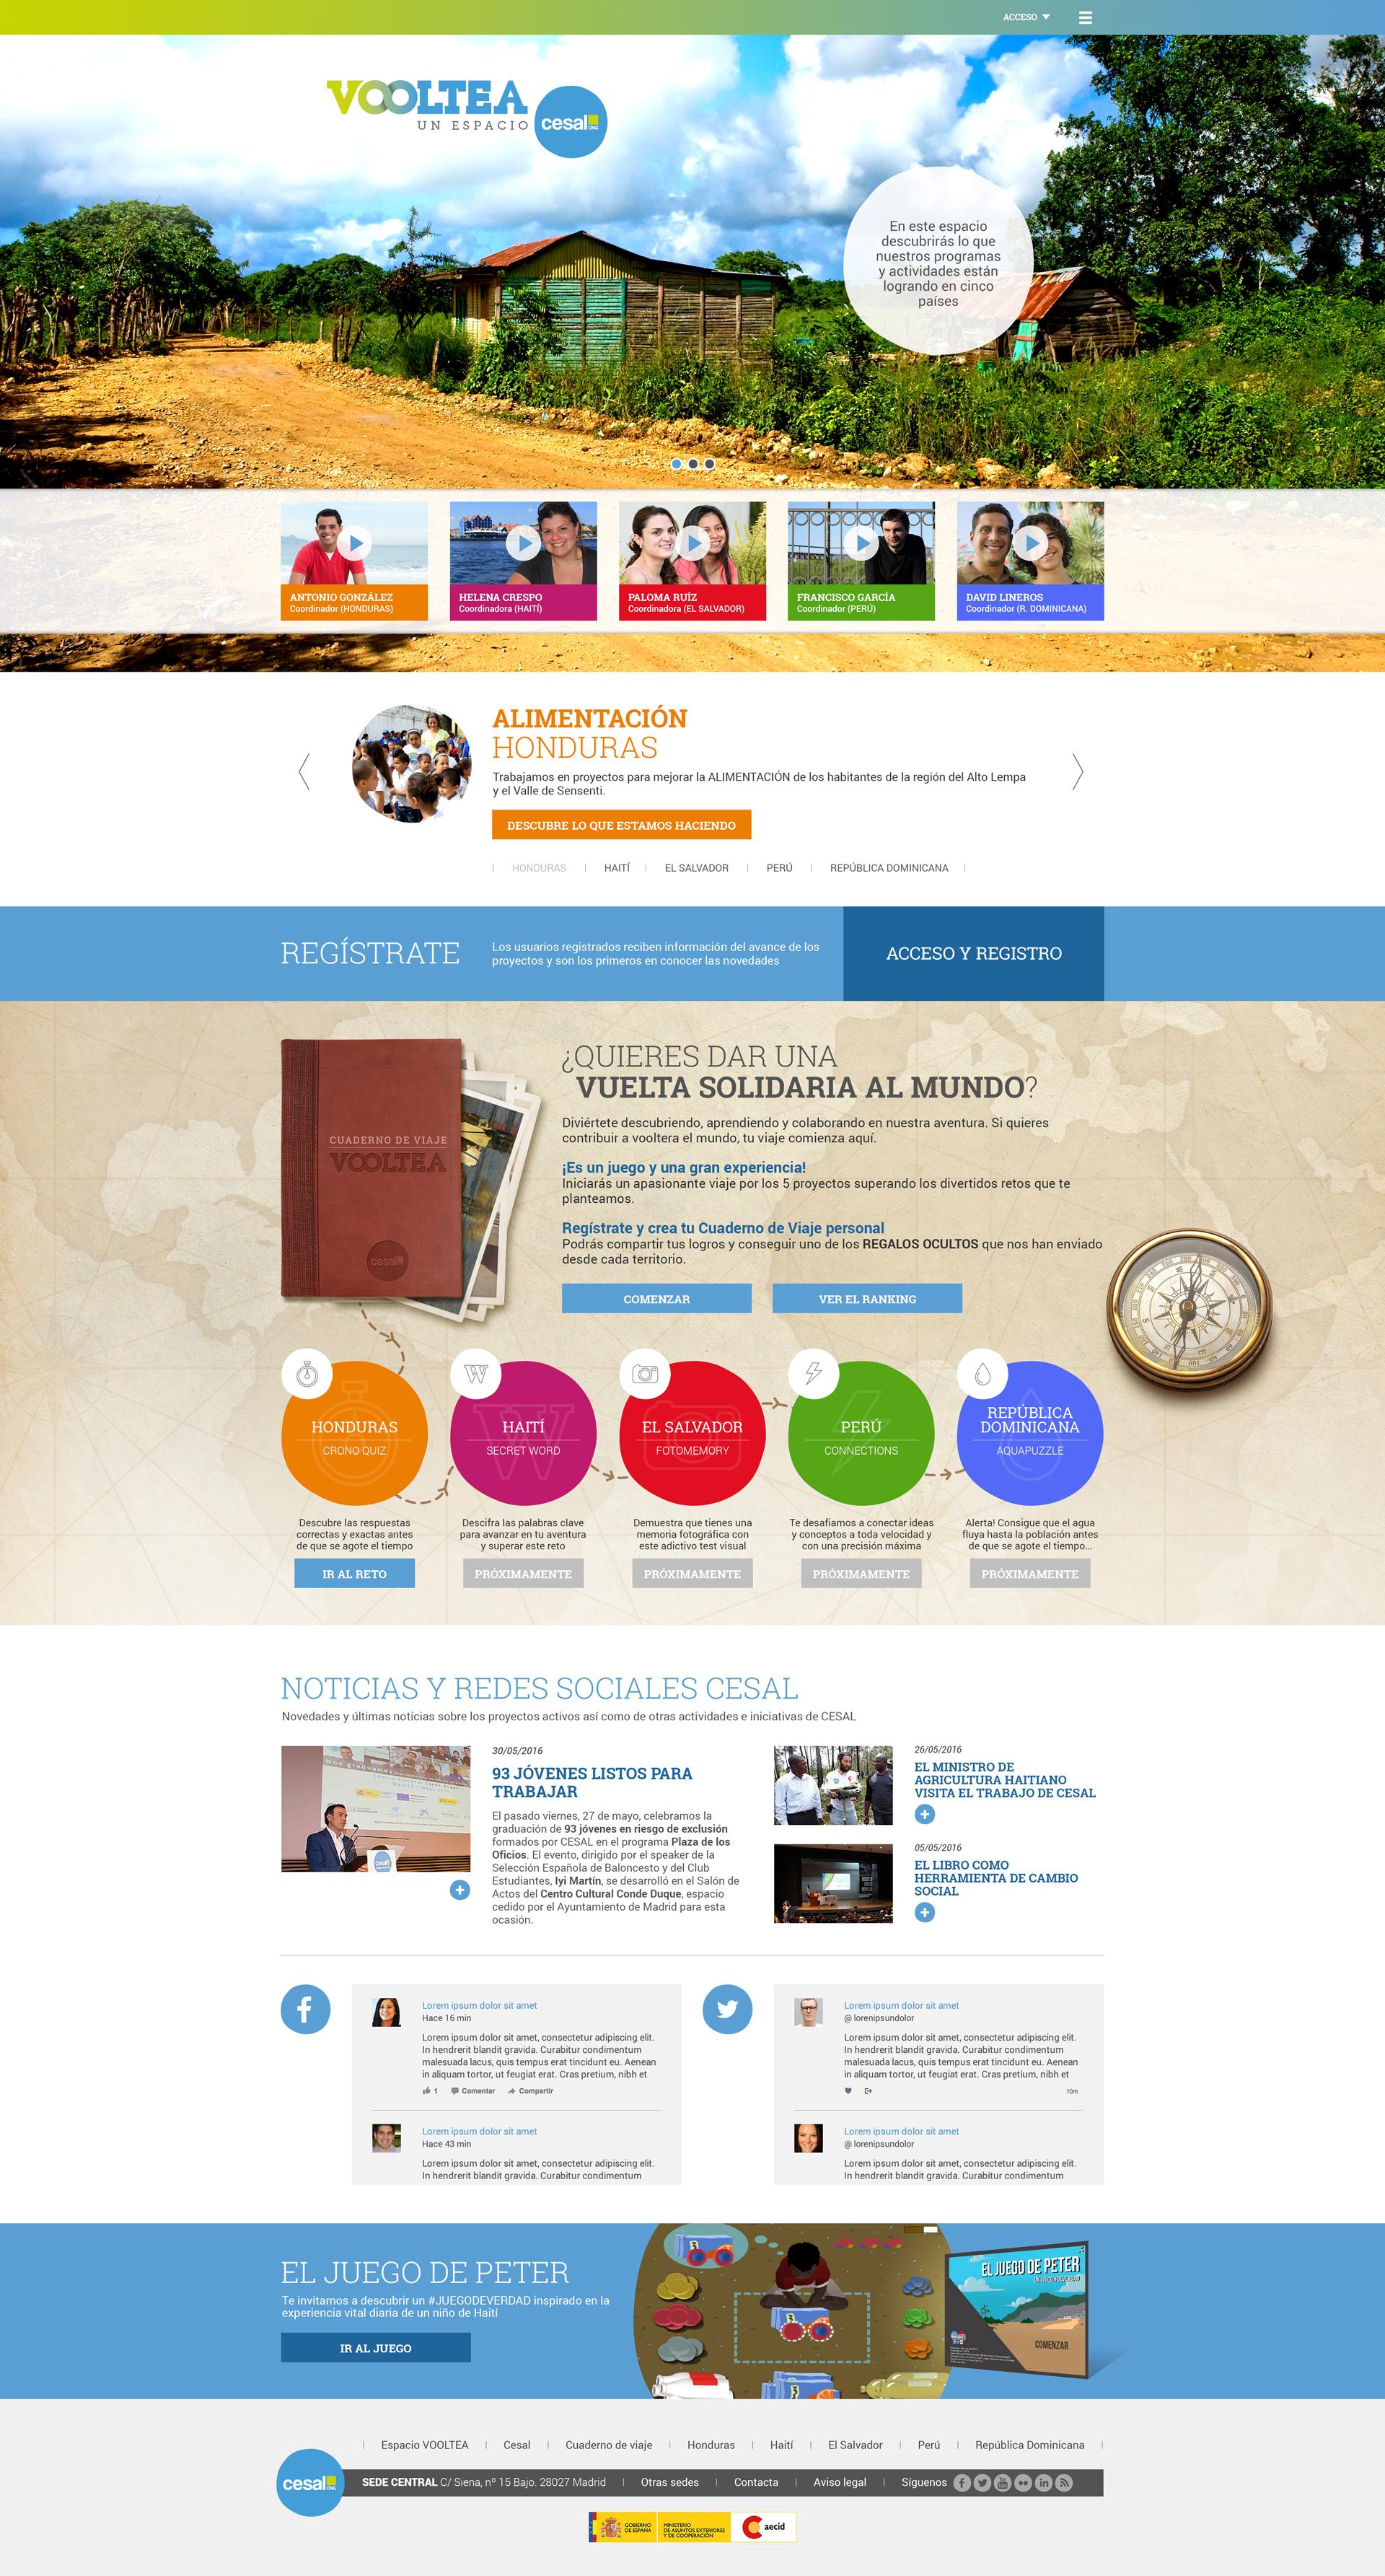 Cvongd Plataforma Educativa E Interactiva Para Jovenes Y Docentes